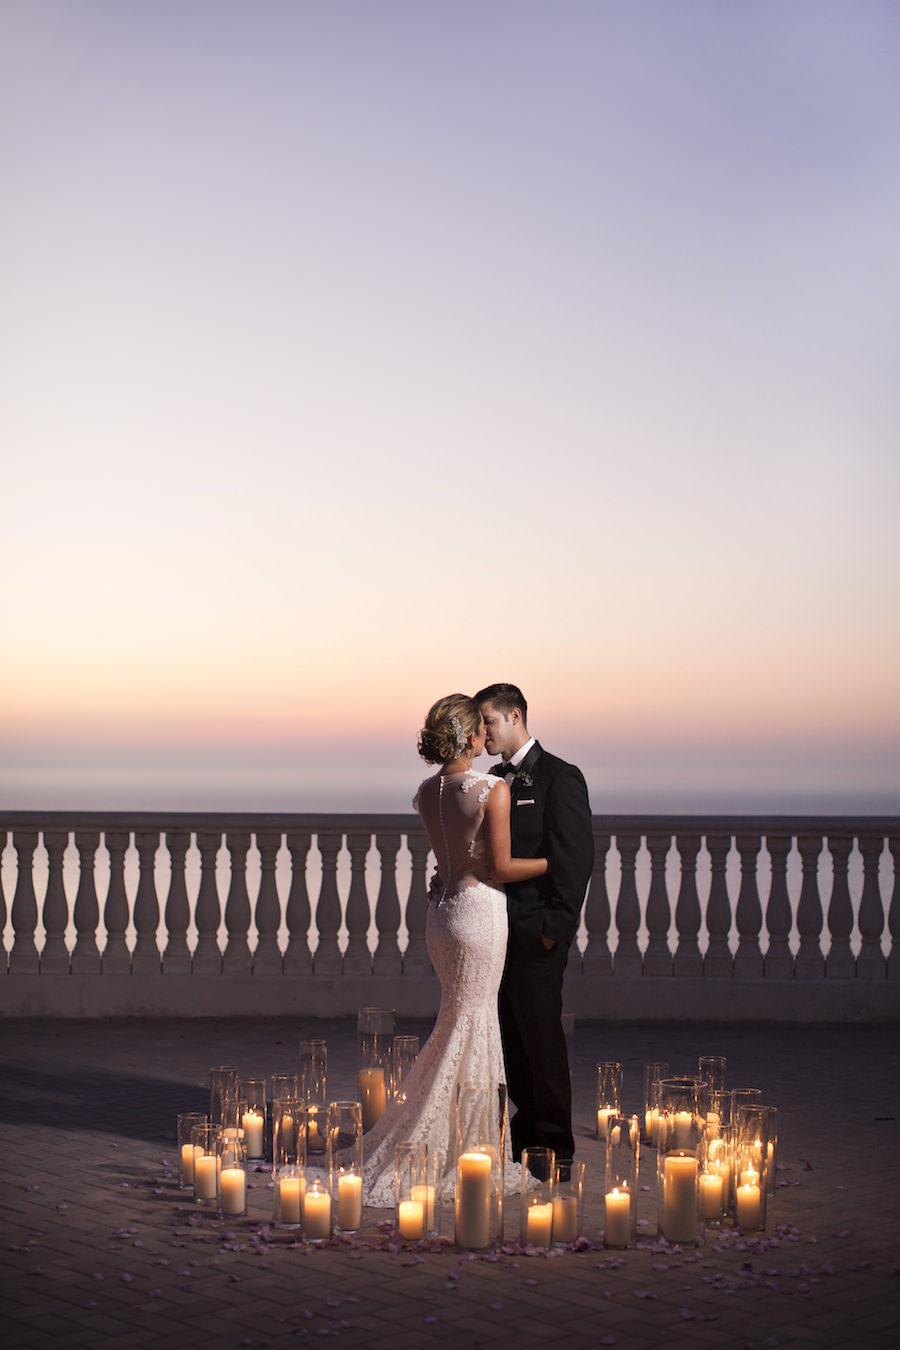 Sunset Candlelit Wedding Portrait | Clearwater Beach Wedding Venue Hyatt Regency | Wedding Planner Special Moments Event Planning | Djamel Photography